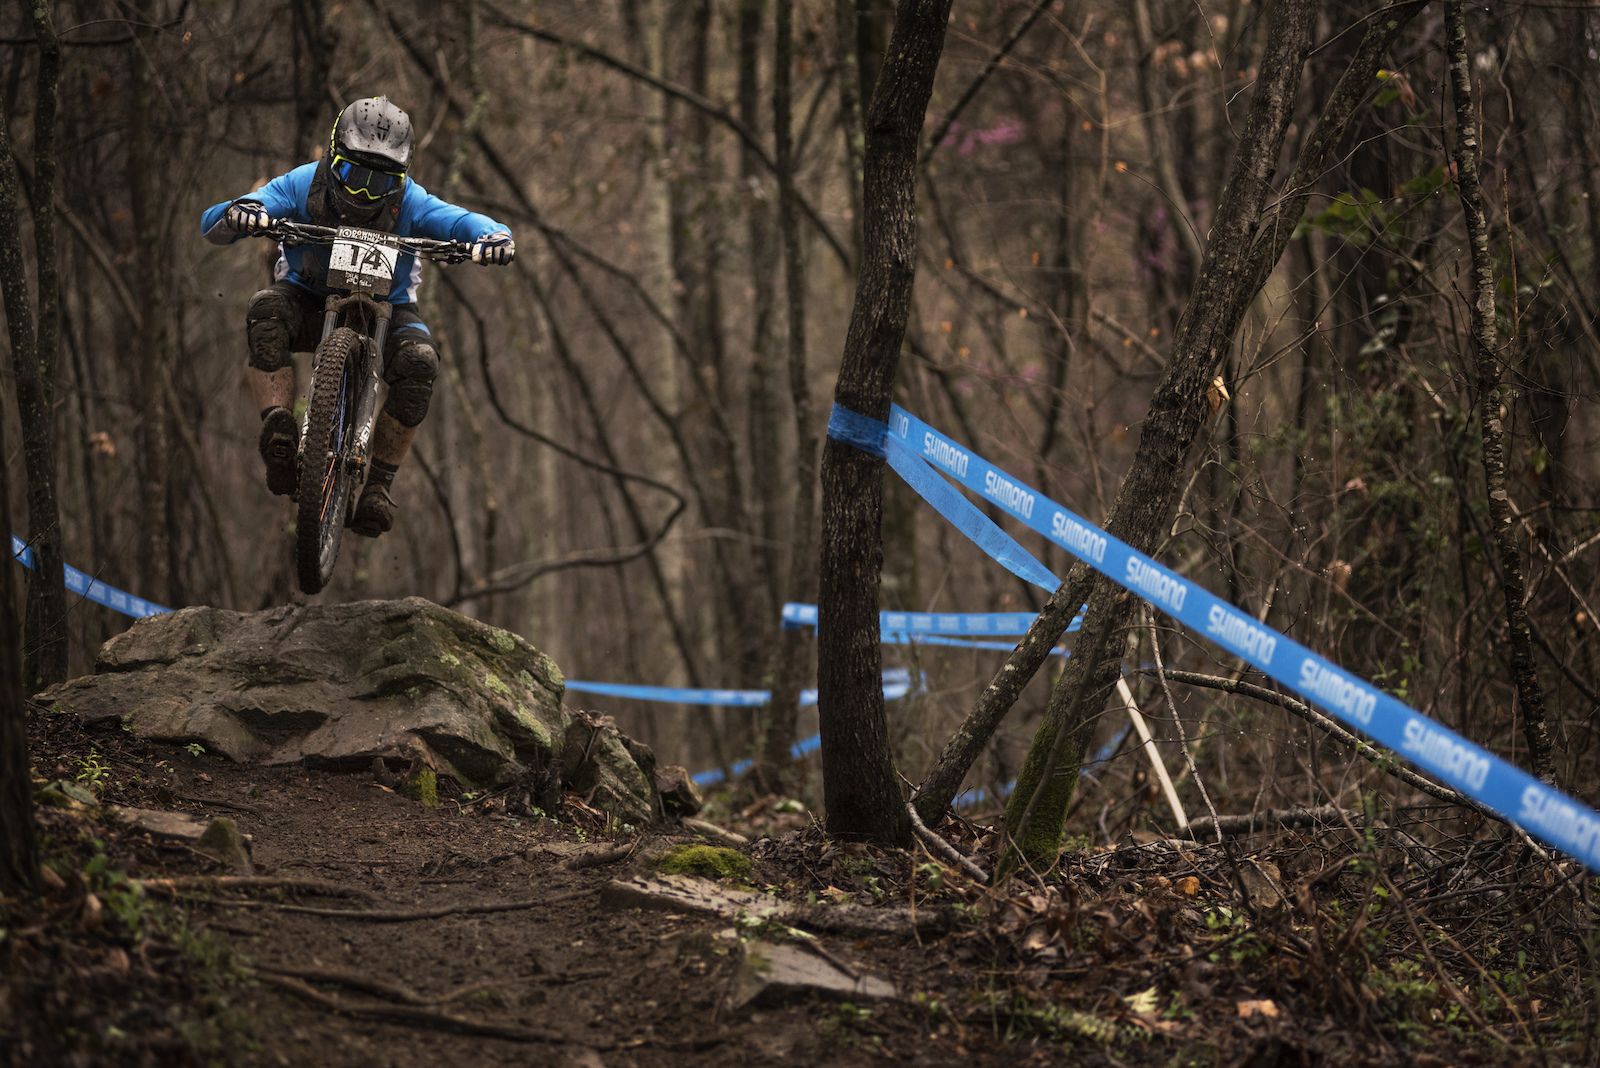 Downhill Southeast - Round Two Race Recap